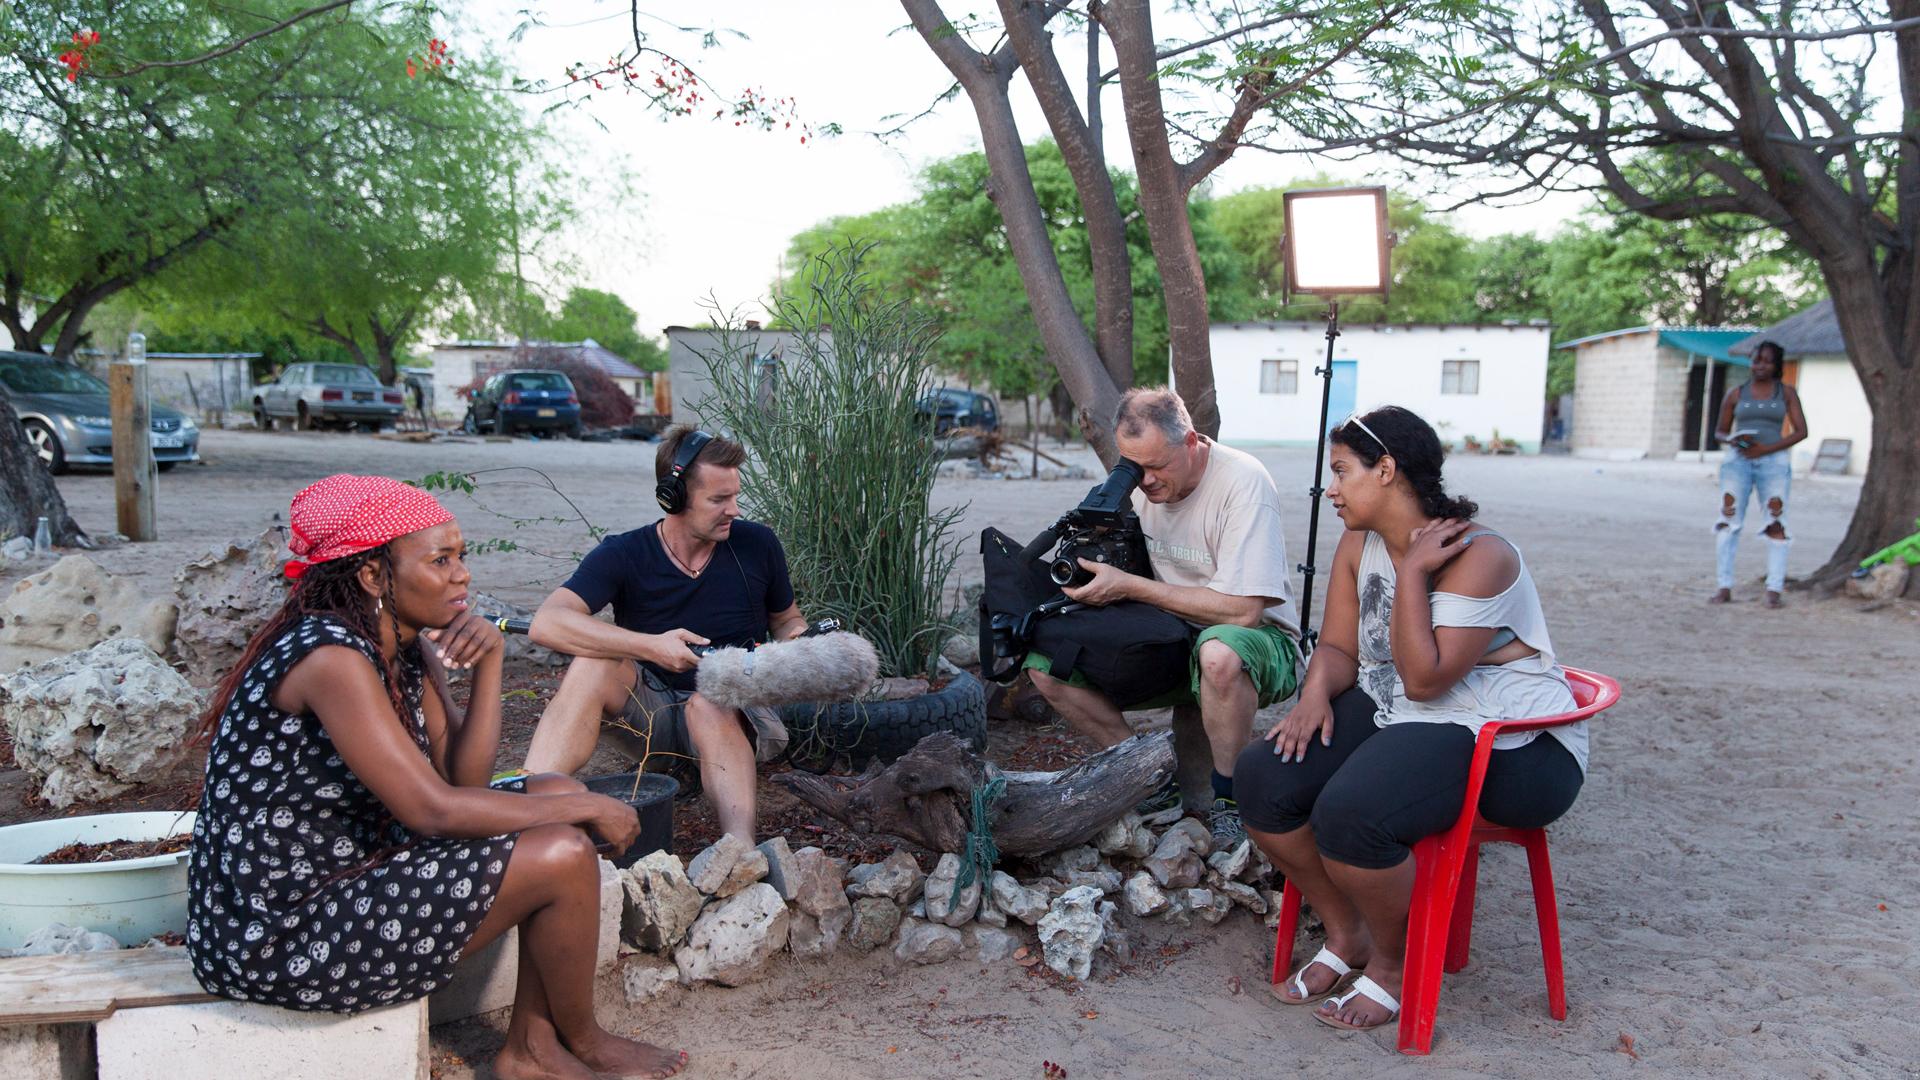 Arte Documentary - Queens of Botswana - Making of Image 11